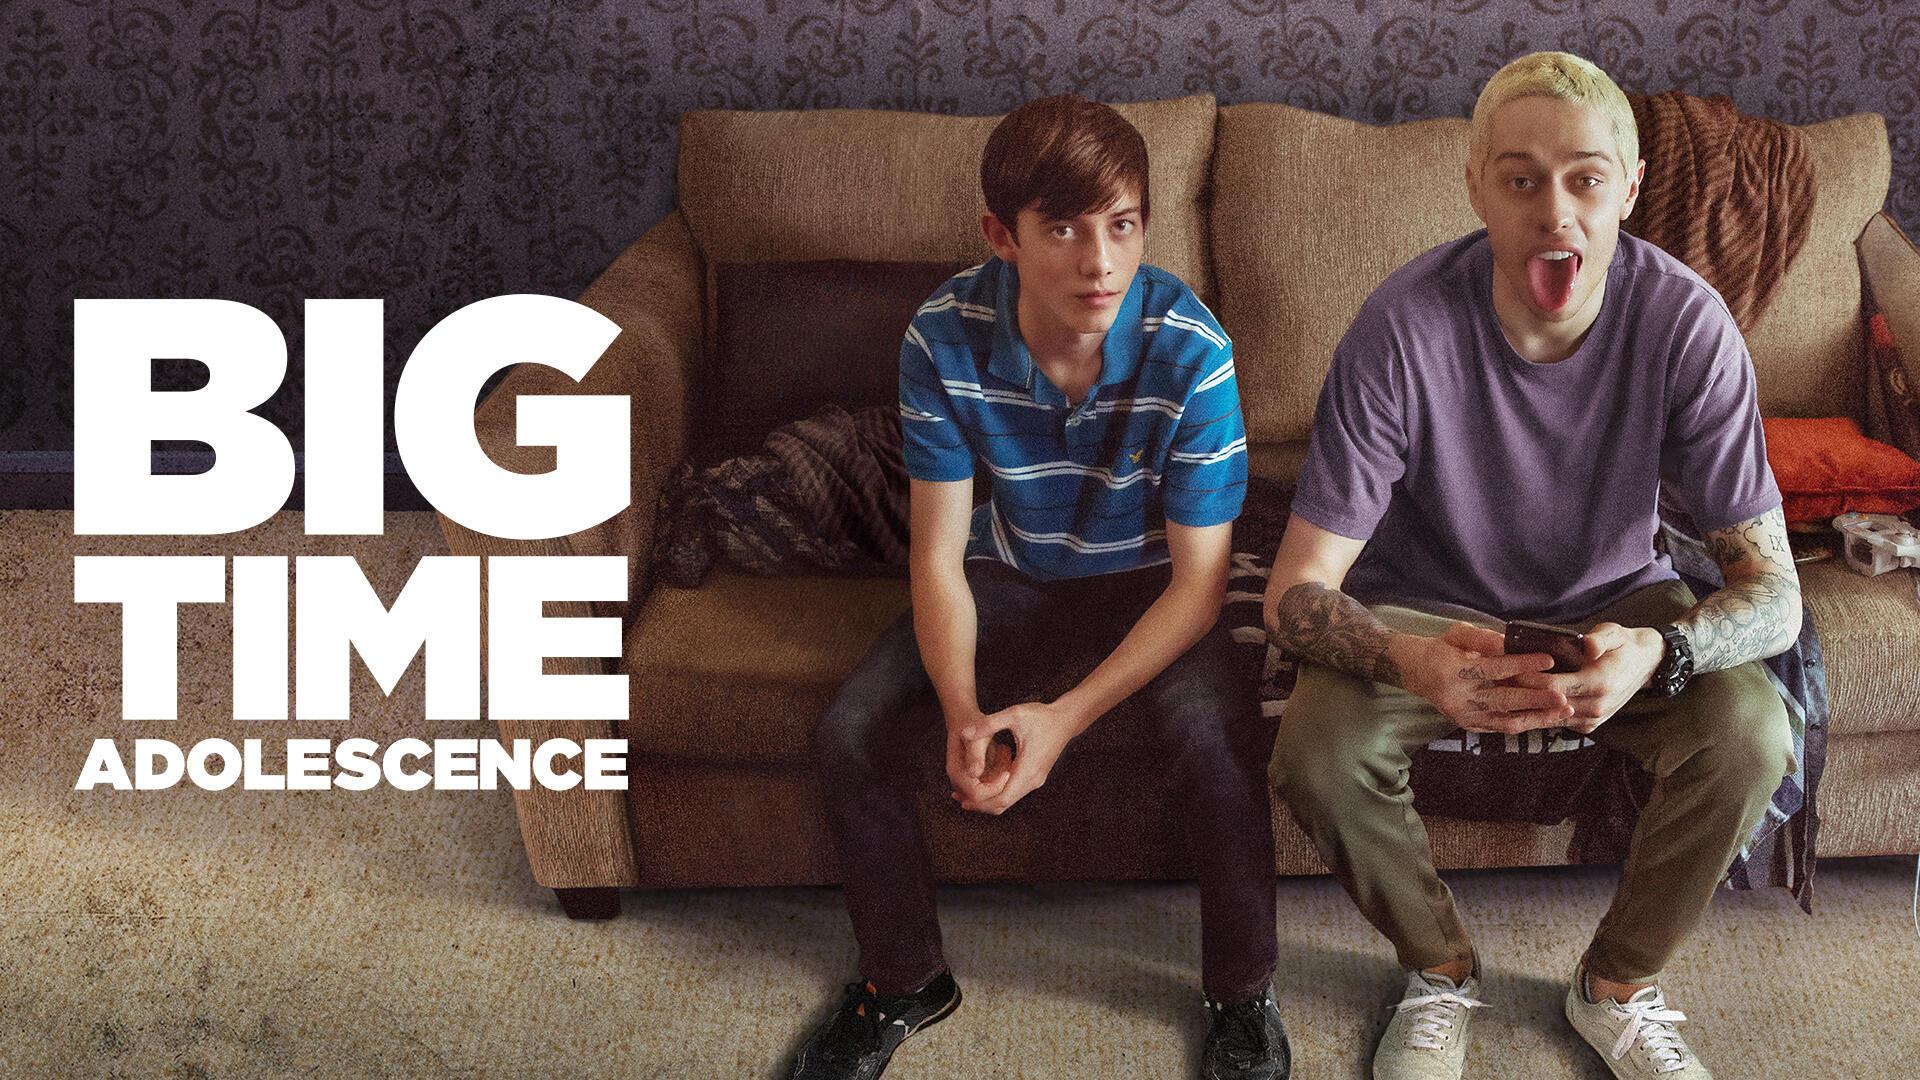 Big_Time_Adolescence_16x9